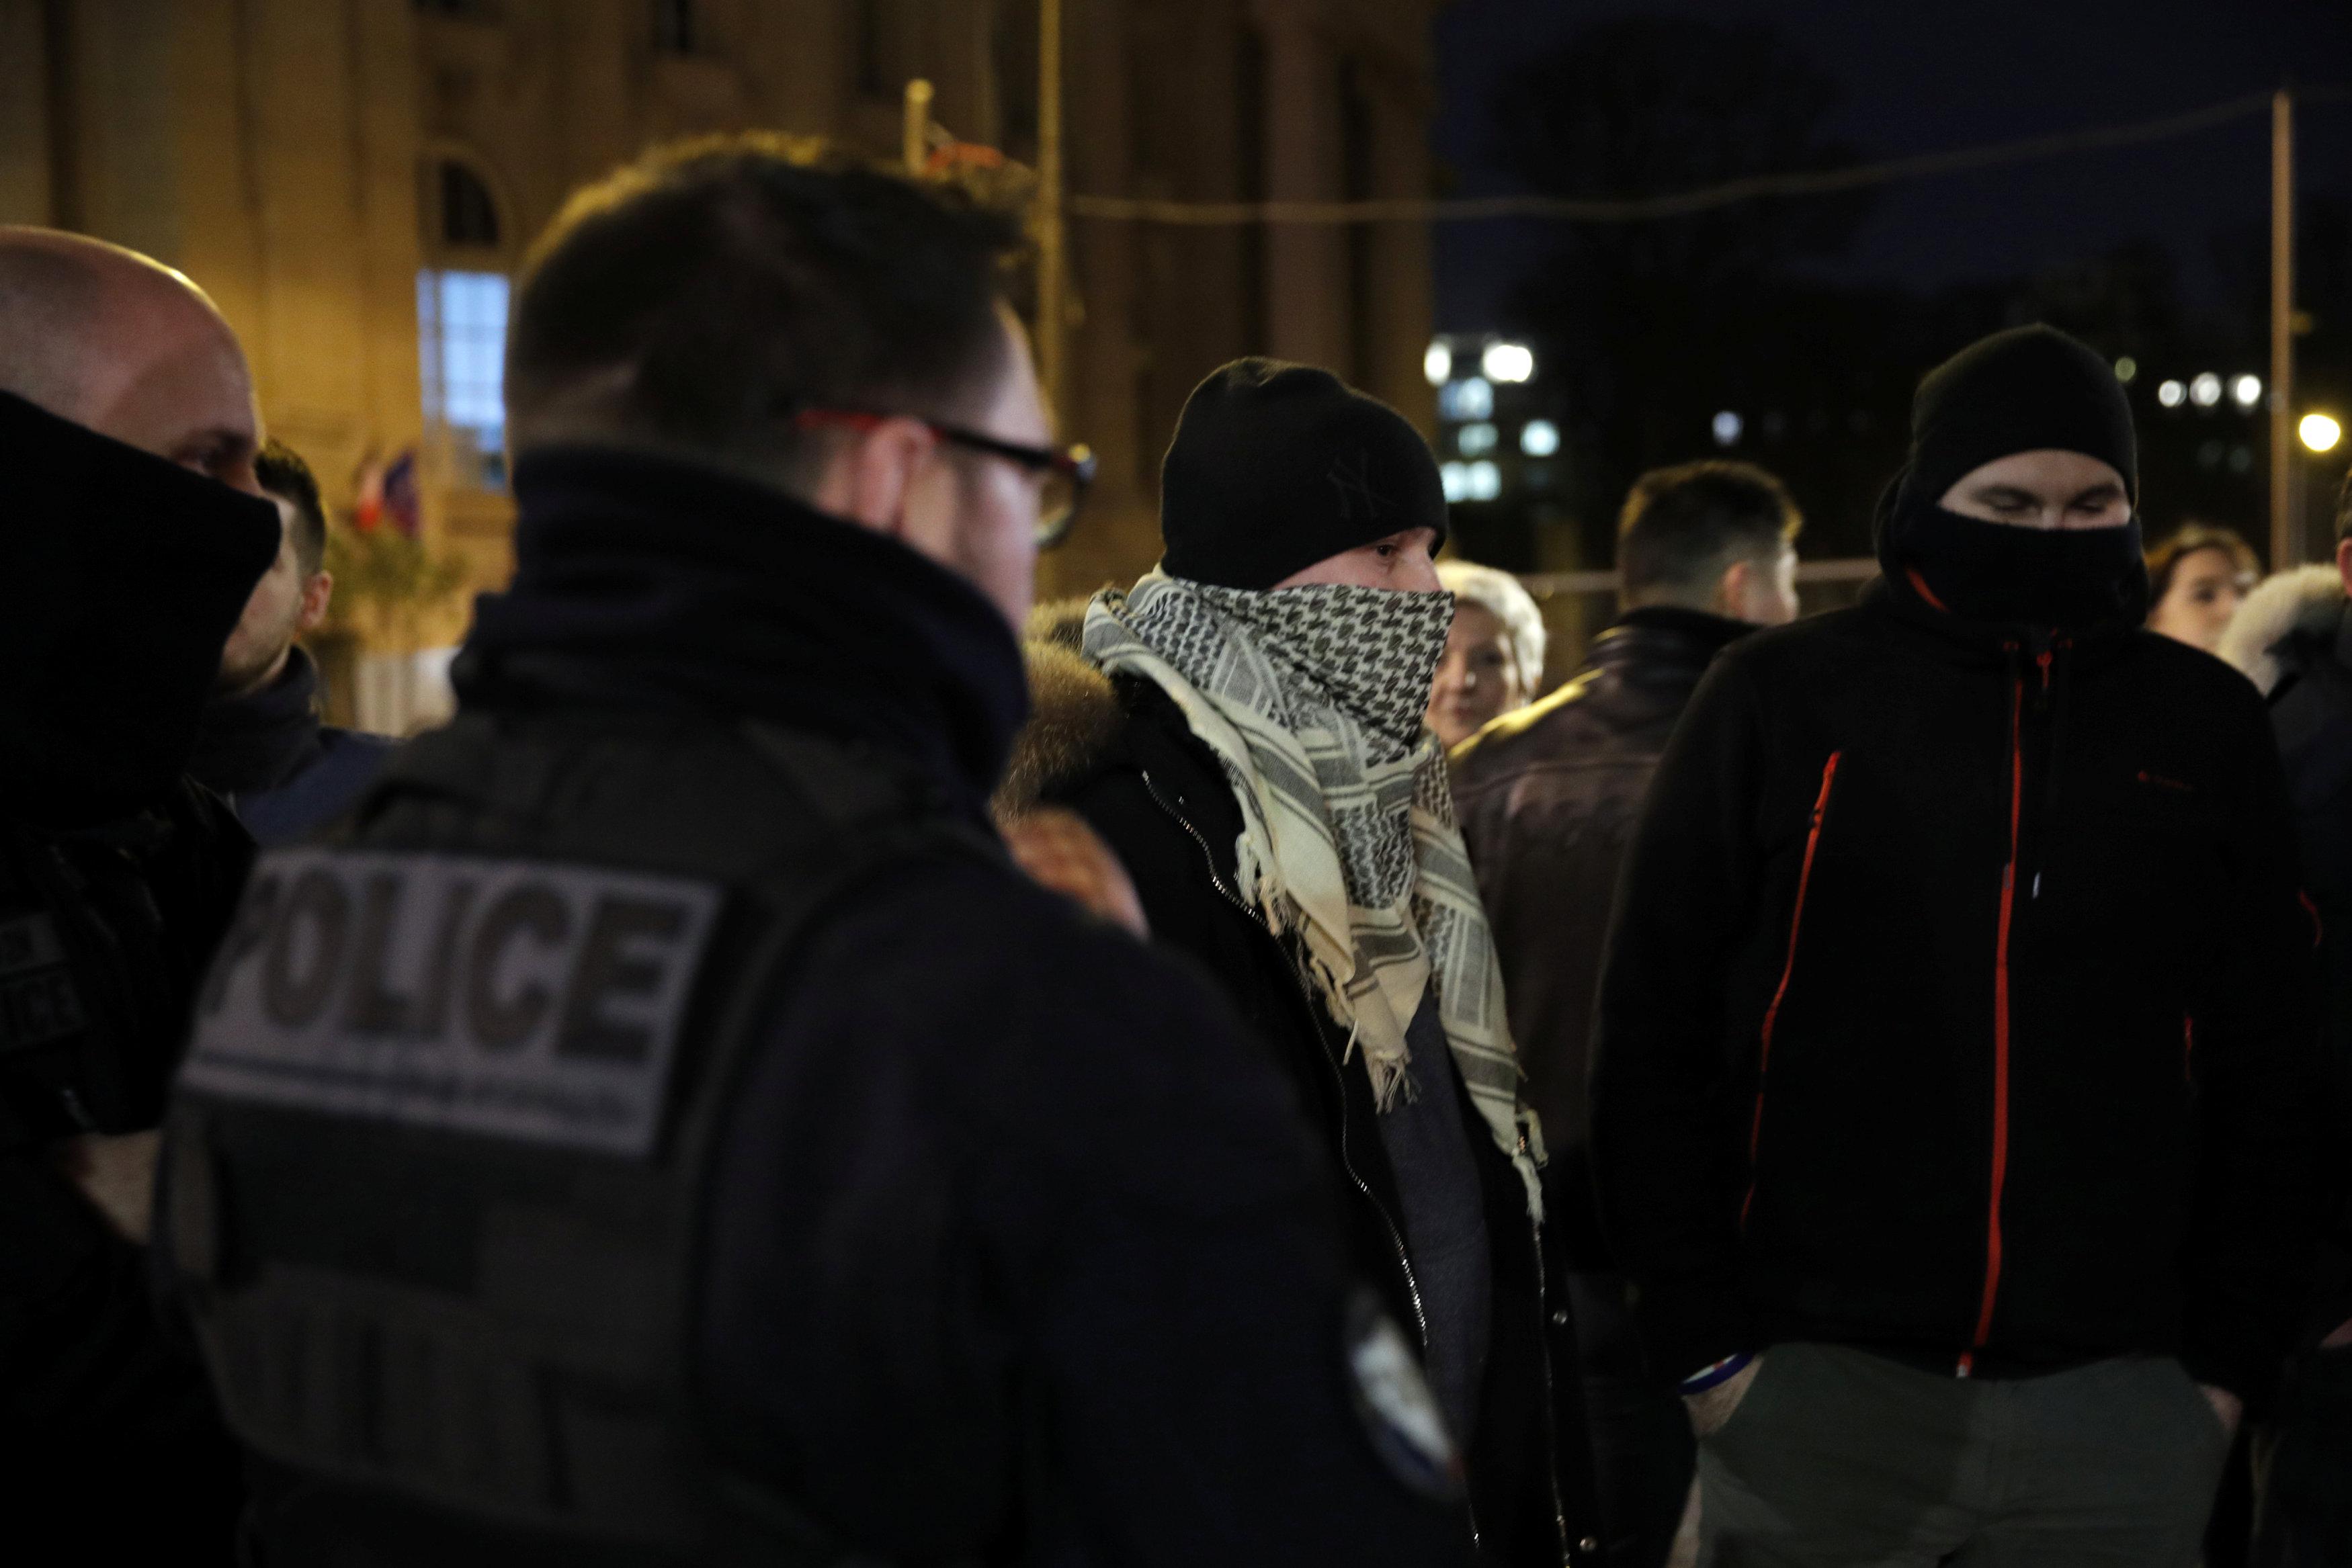 2018-12-20T222556Z_767041257_RC140373E900_RTRMADP_3_FRANCE-PROTESTS-POLICE